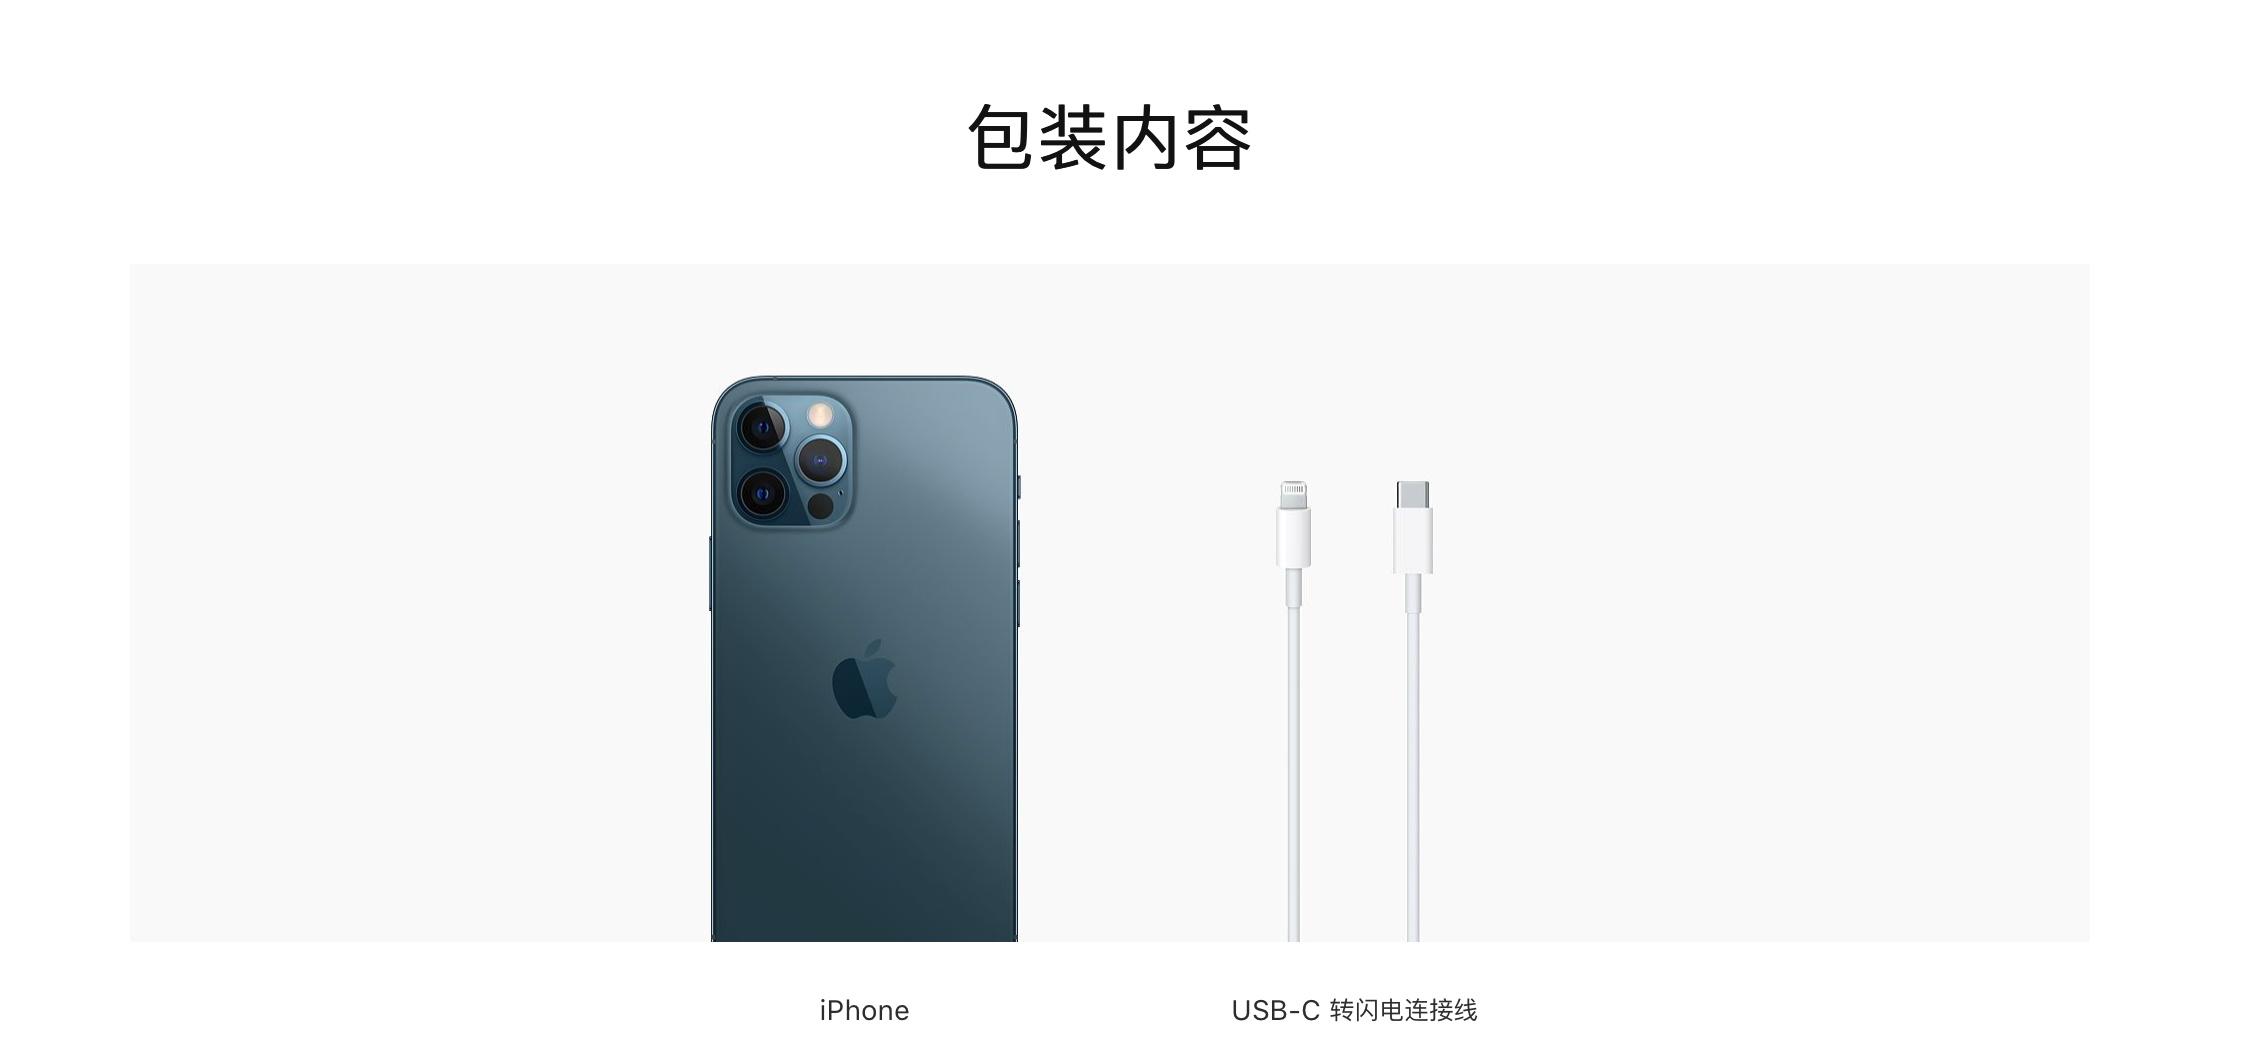 iPhone 11/iPhone XR/iPhone SE也不再附赠电源适配器和耳机